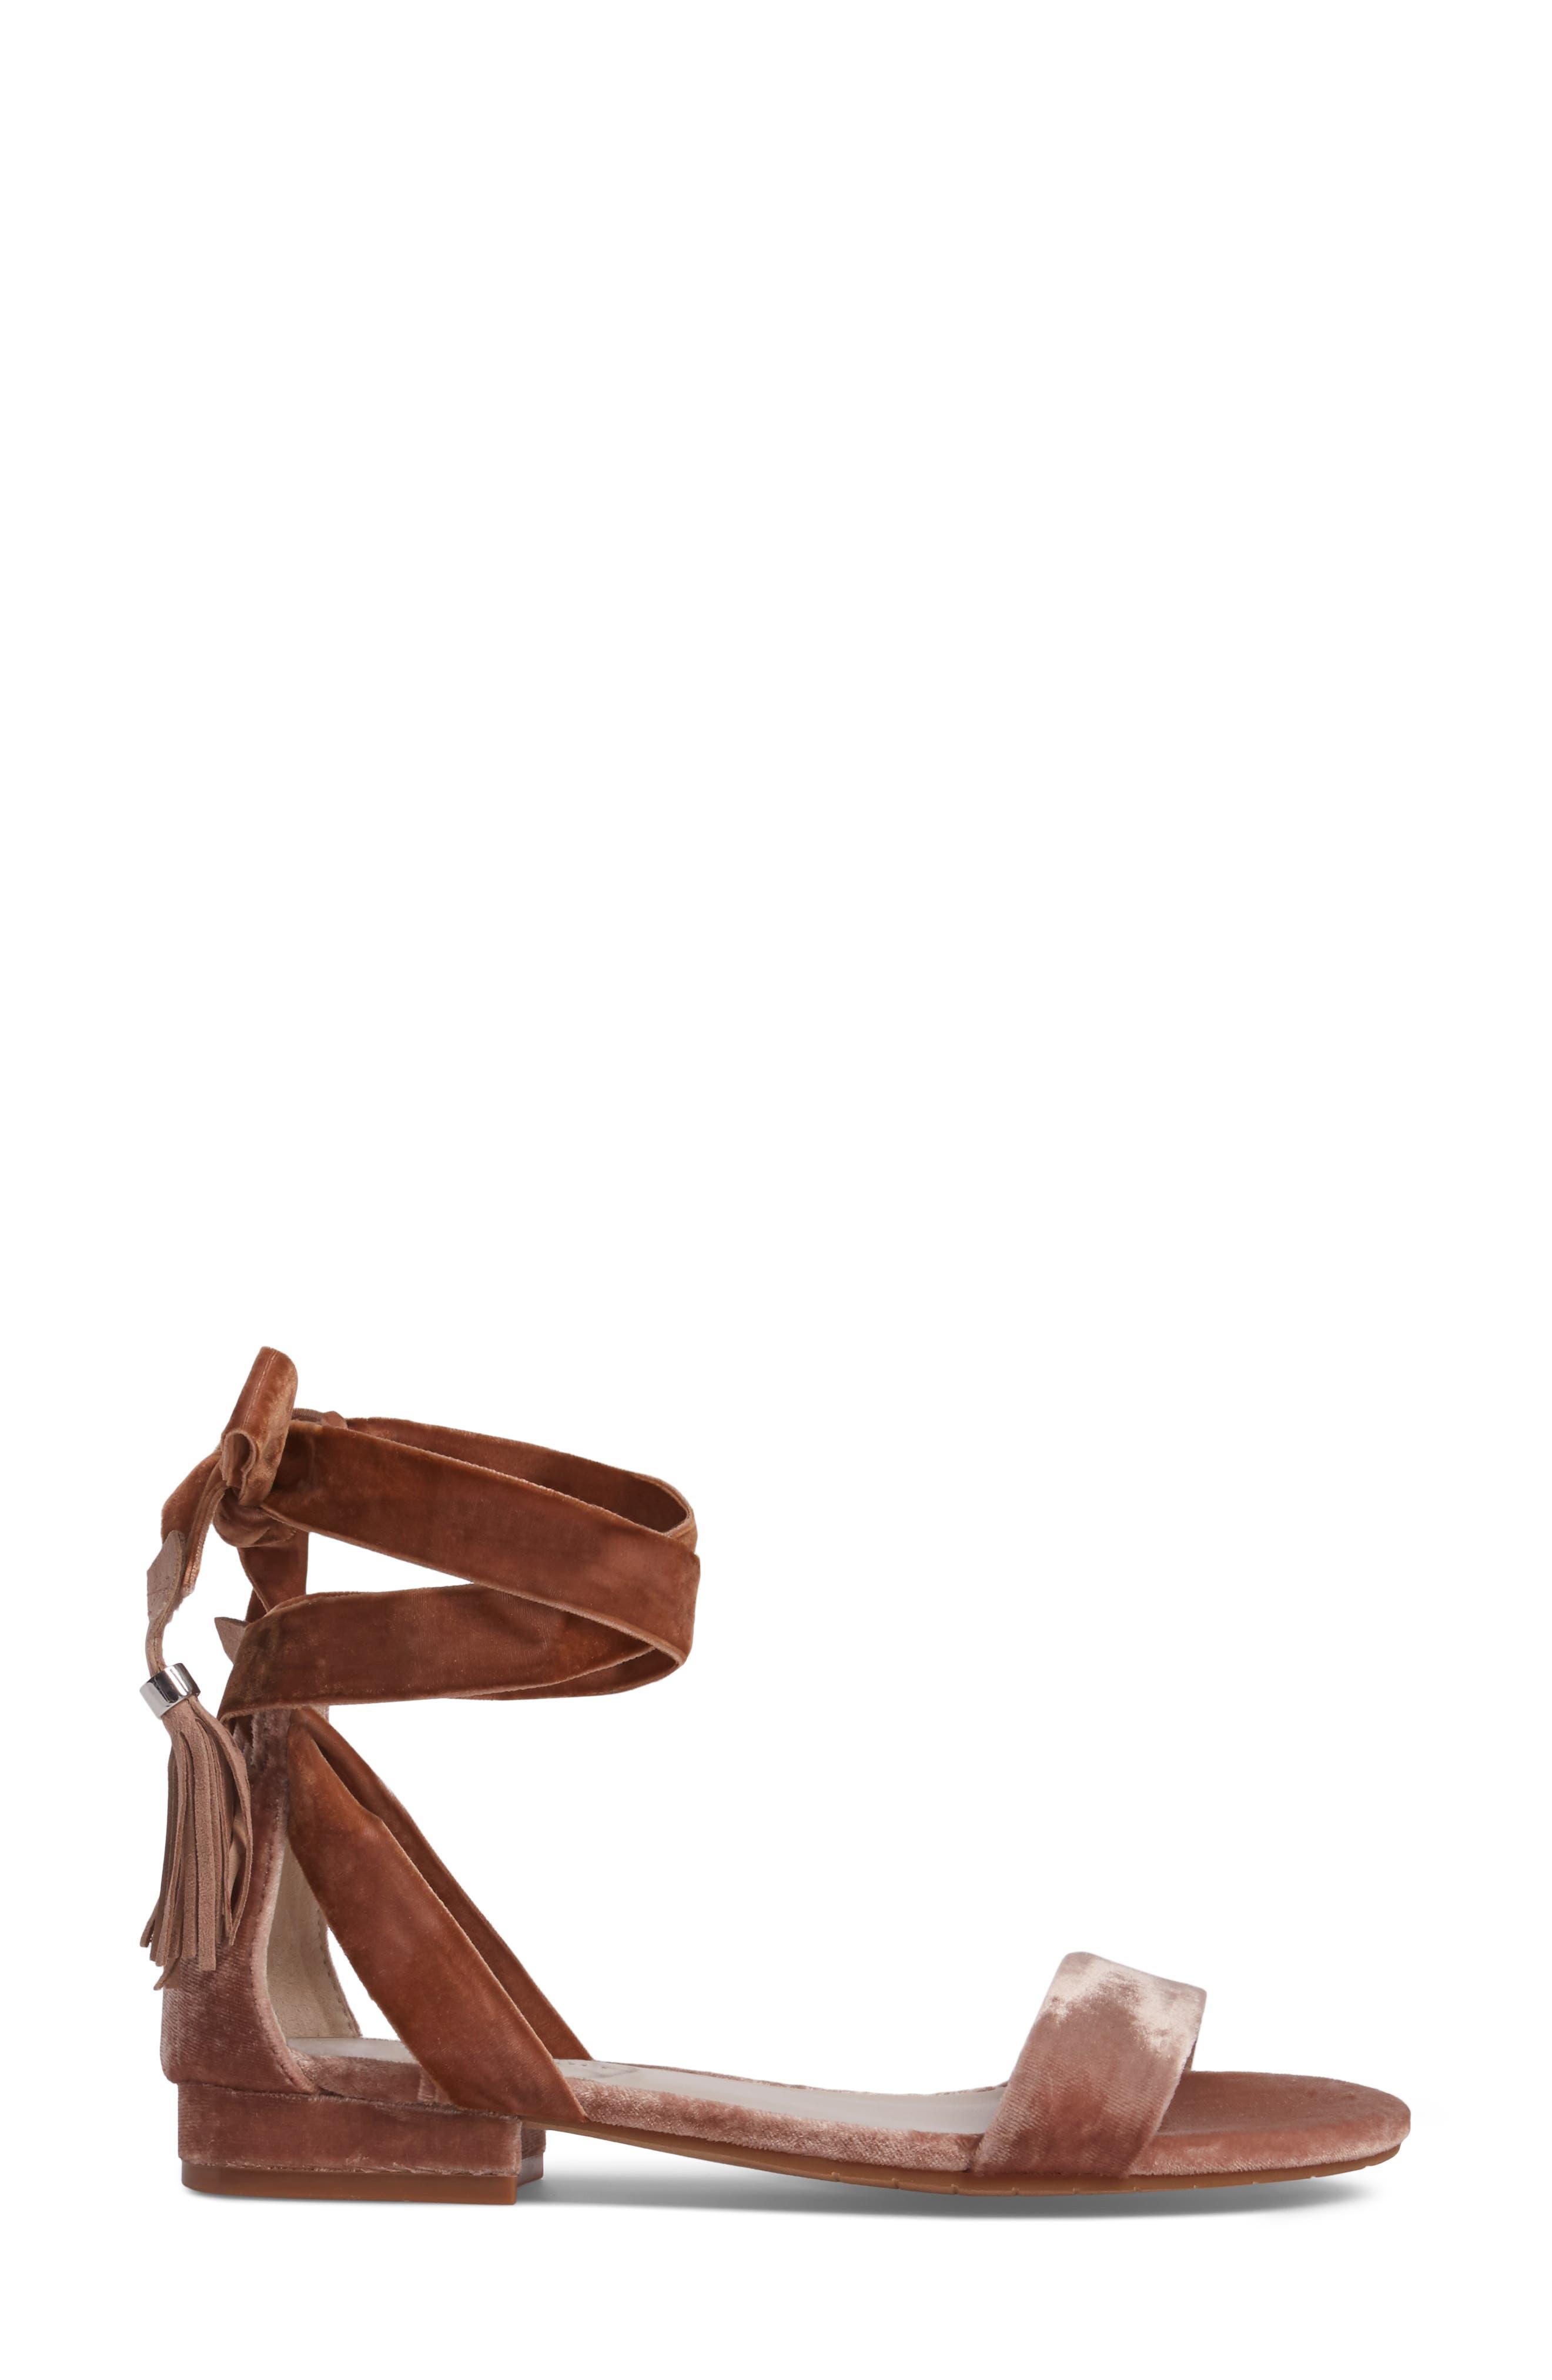 Valen Tassel Lace-Up Sandal,                             Alternate thumbnail 33, color,